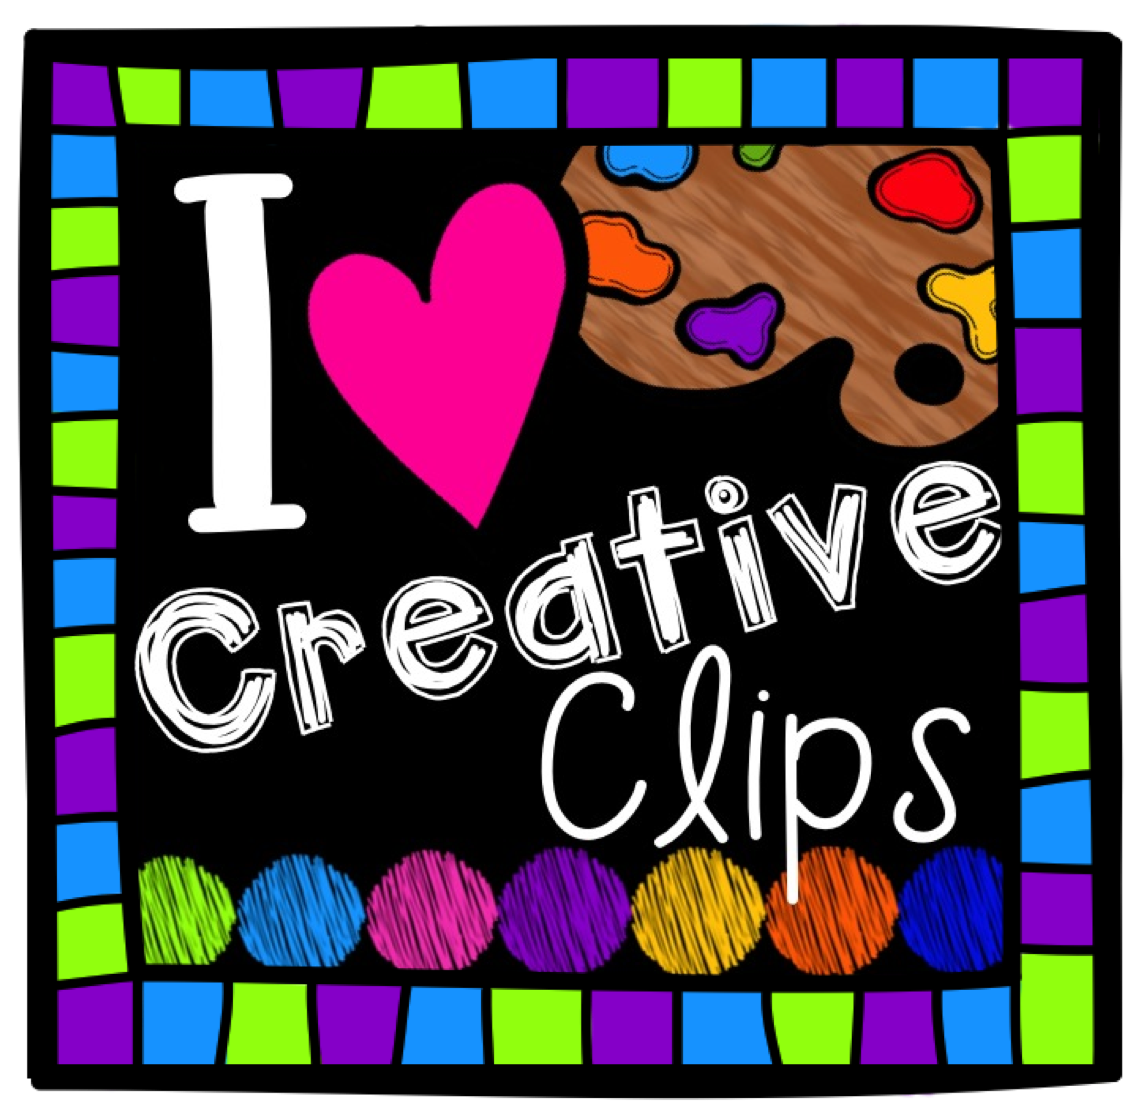 Creative Clips!